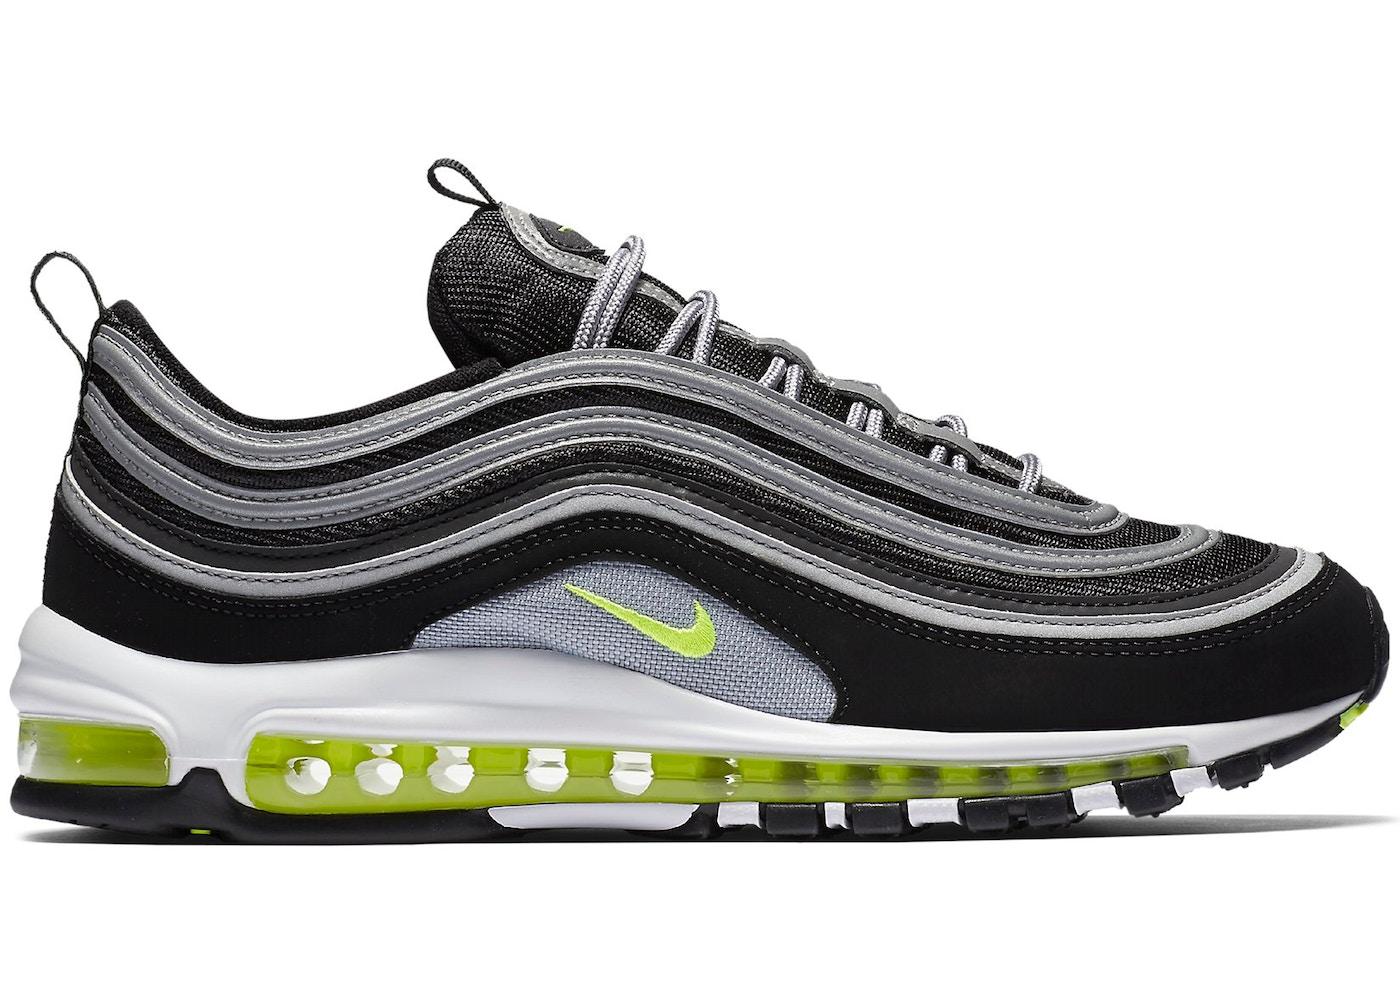 buy popular d19aa 6ce13 18 Reasons to NOT to Buy Nike Air Max 97 OG Metallic Silver (June 2018)    RunRepeat